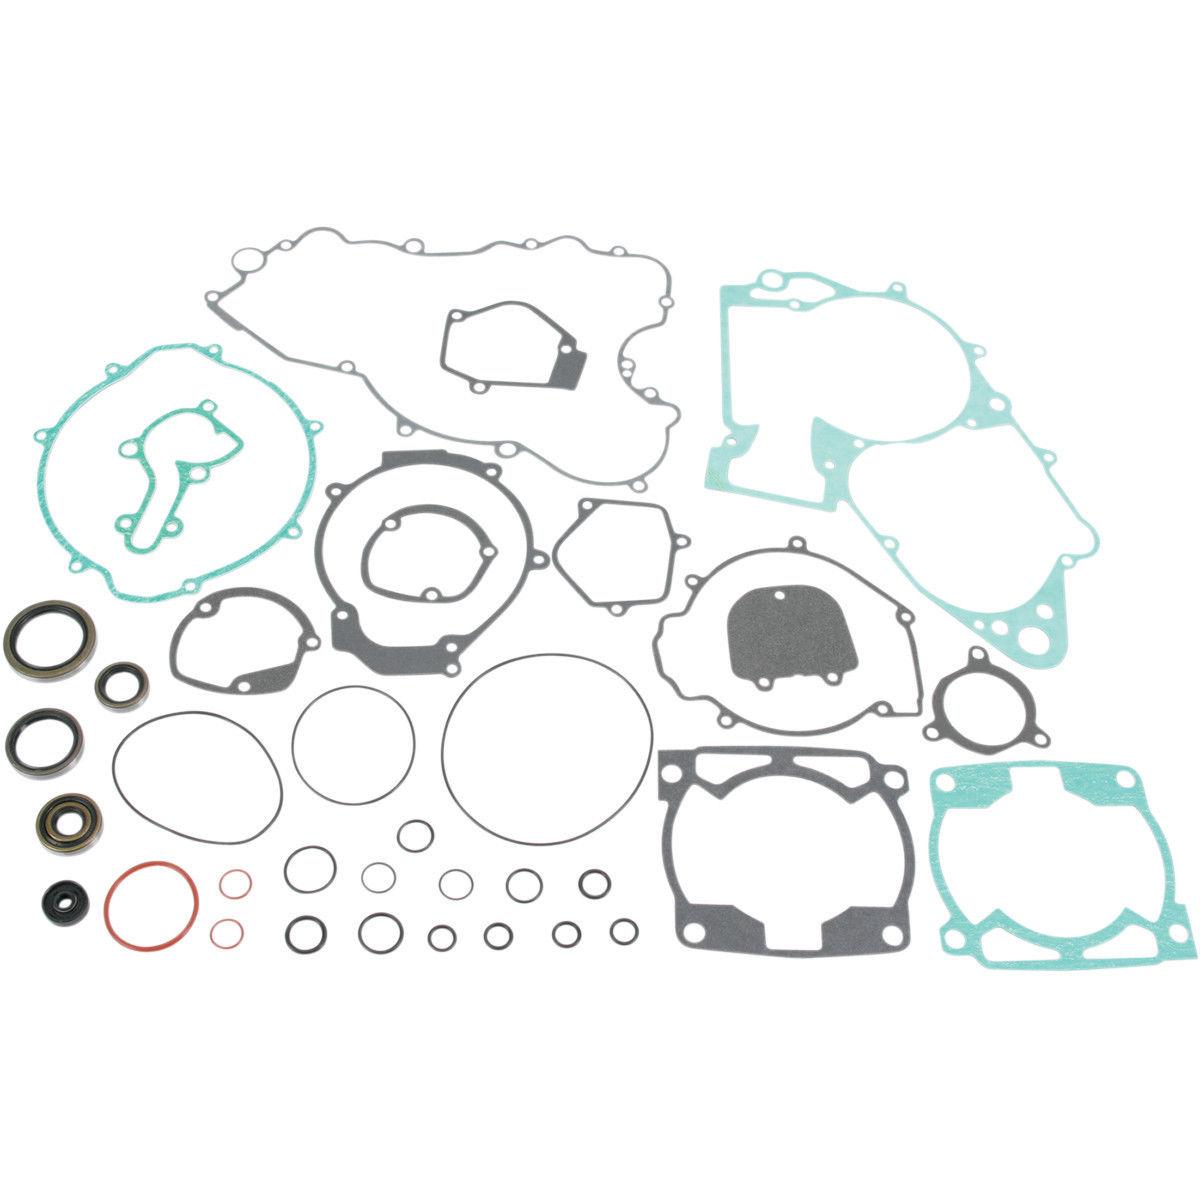 Complete Gasket Kit with Oil Seals Polaris Predator 50,S 811892 Moose Racing